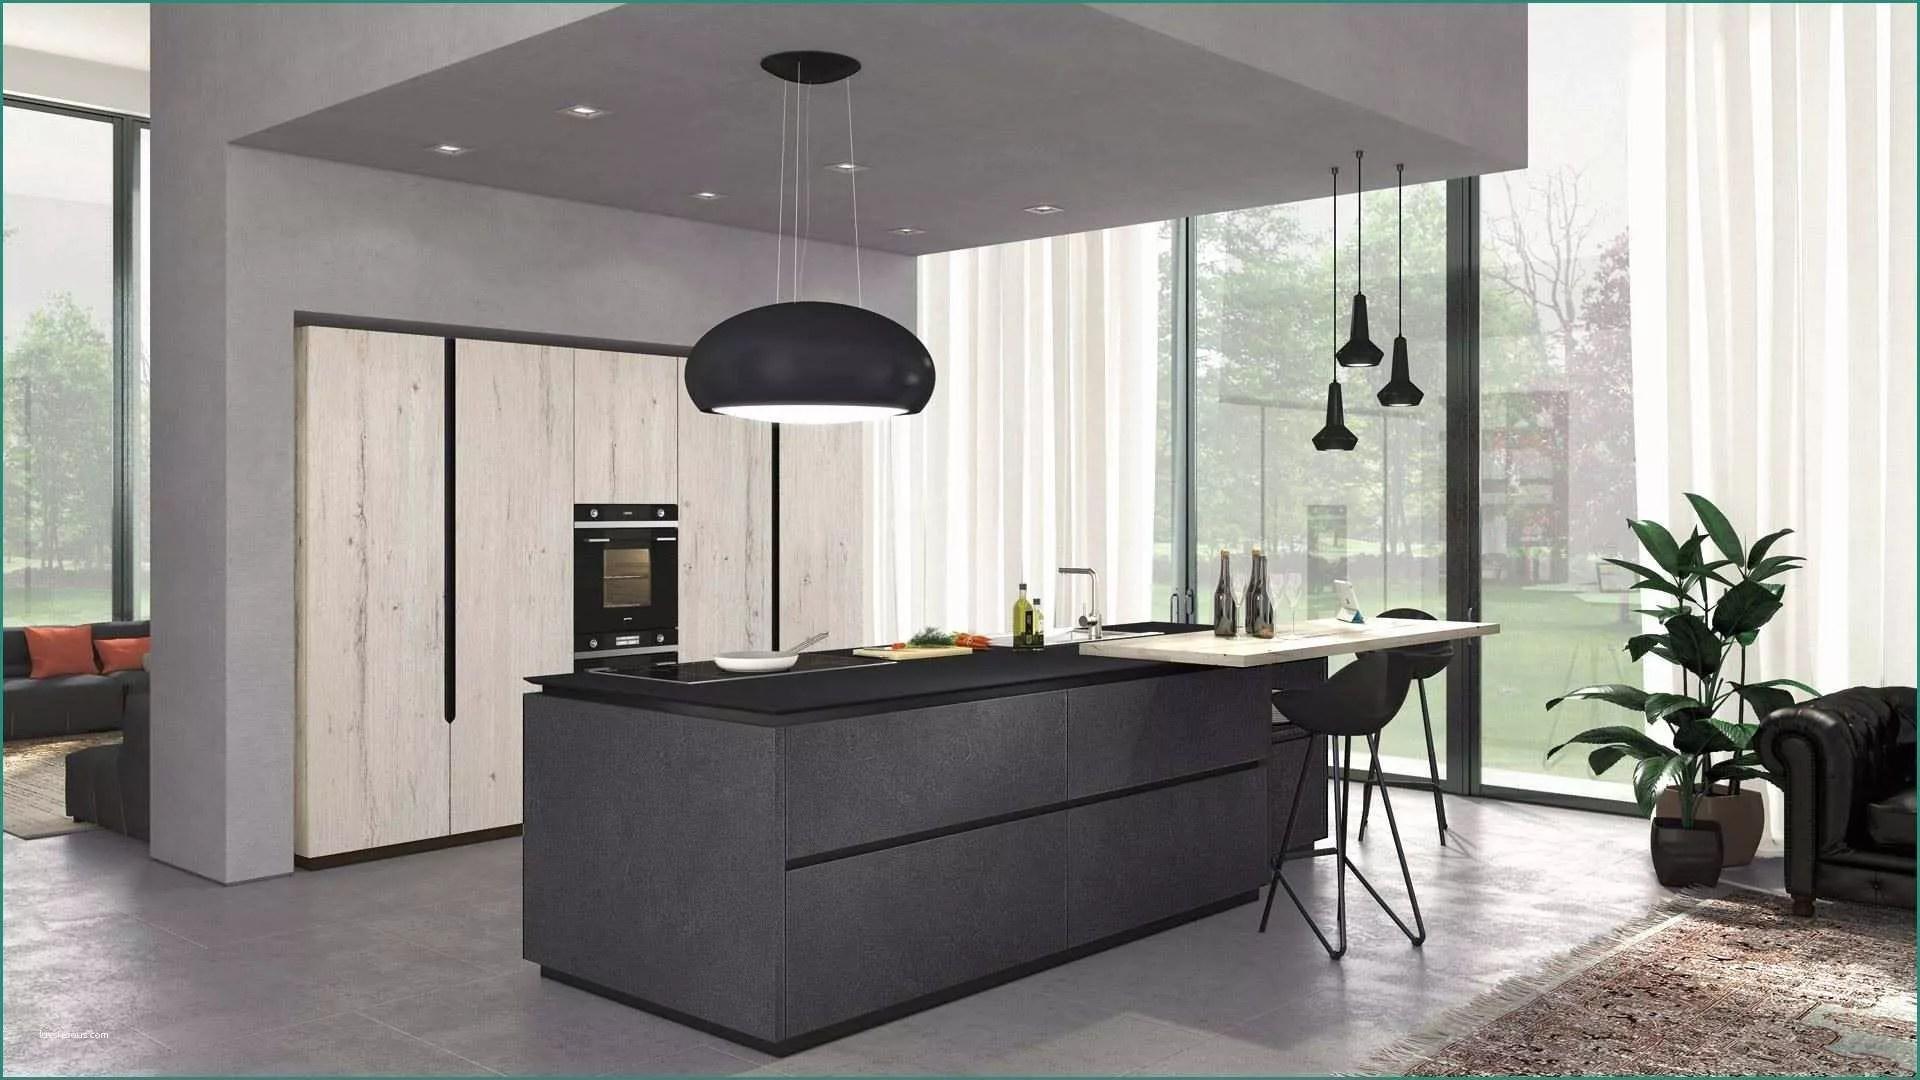 Cucina Modulnova Vetro | Affascinante Schienale Cucina In Vetro ...